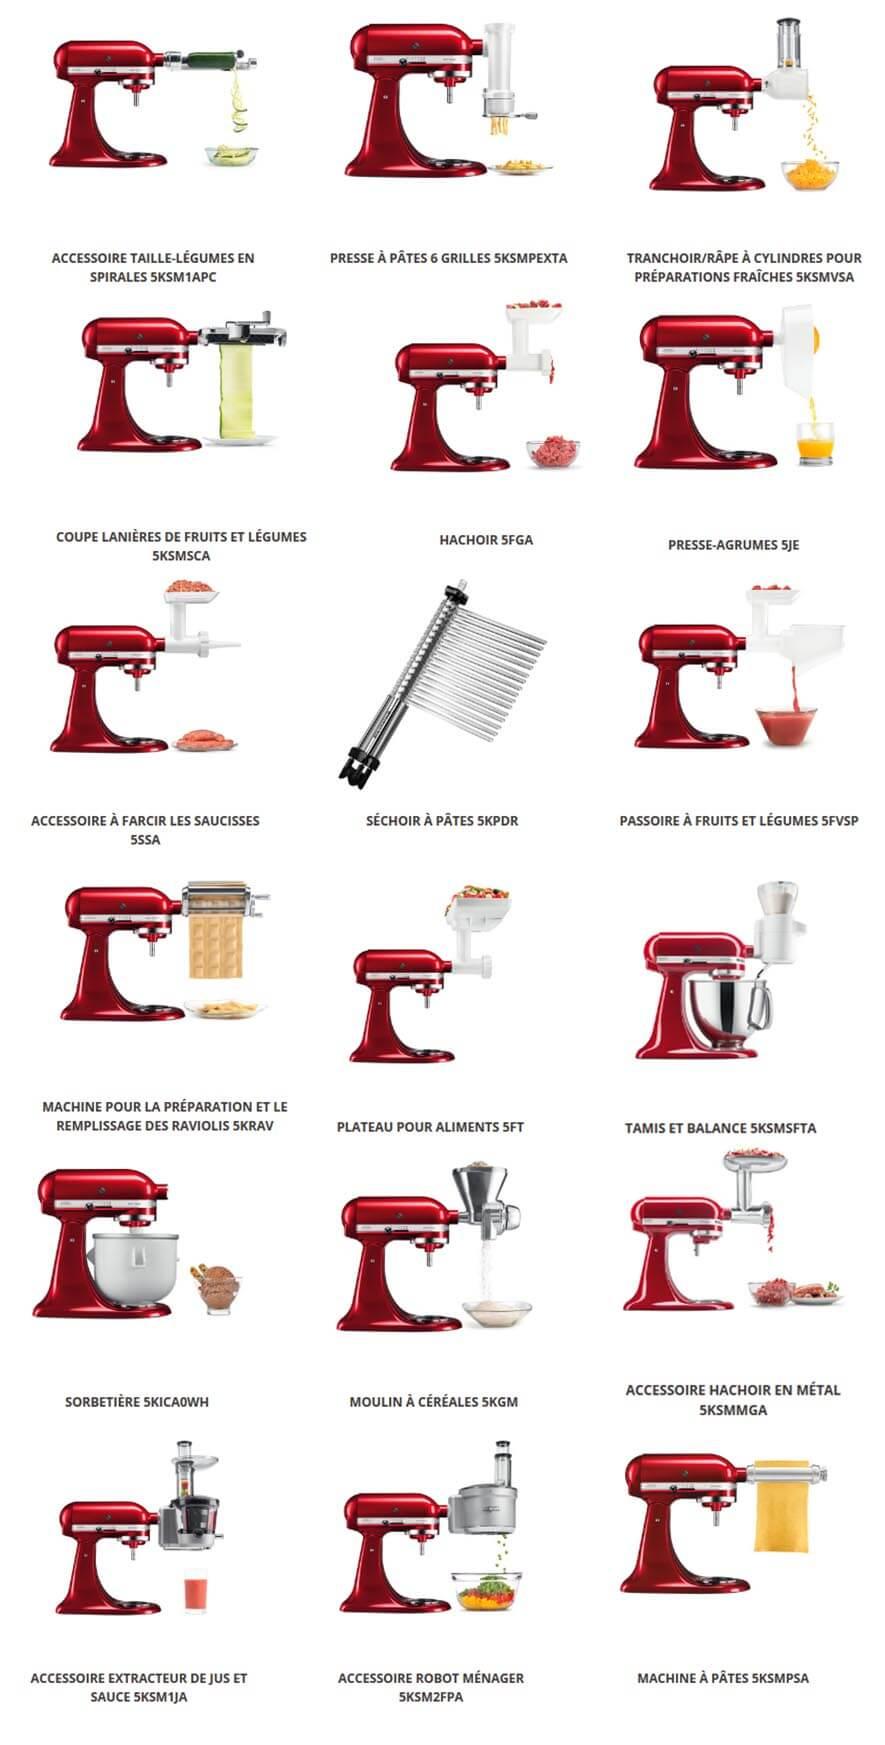 kitchenaid artisan le robot patissier